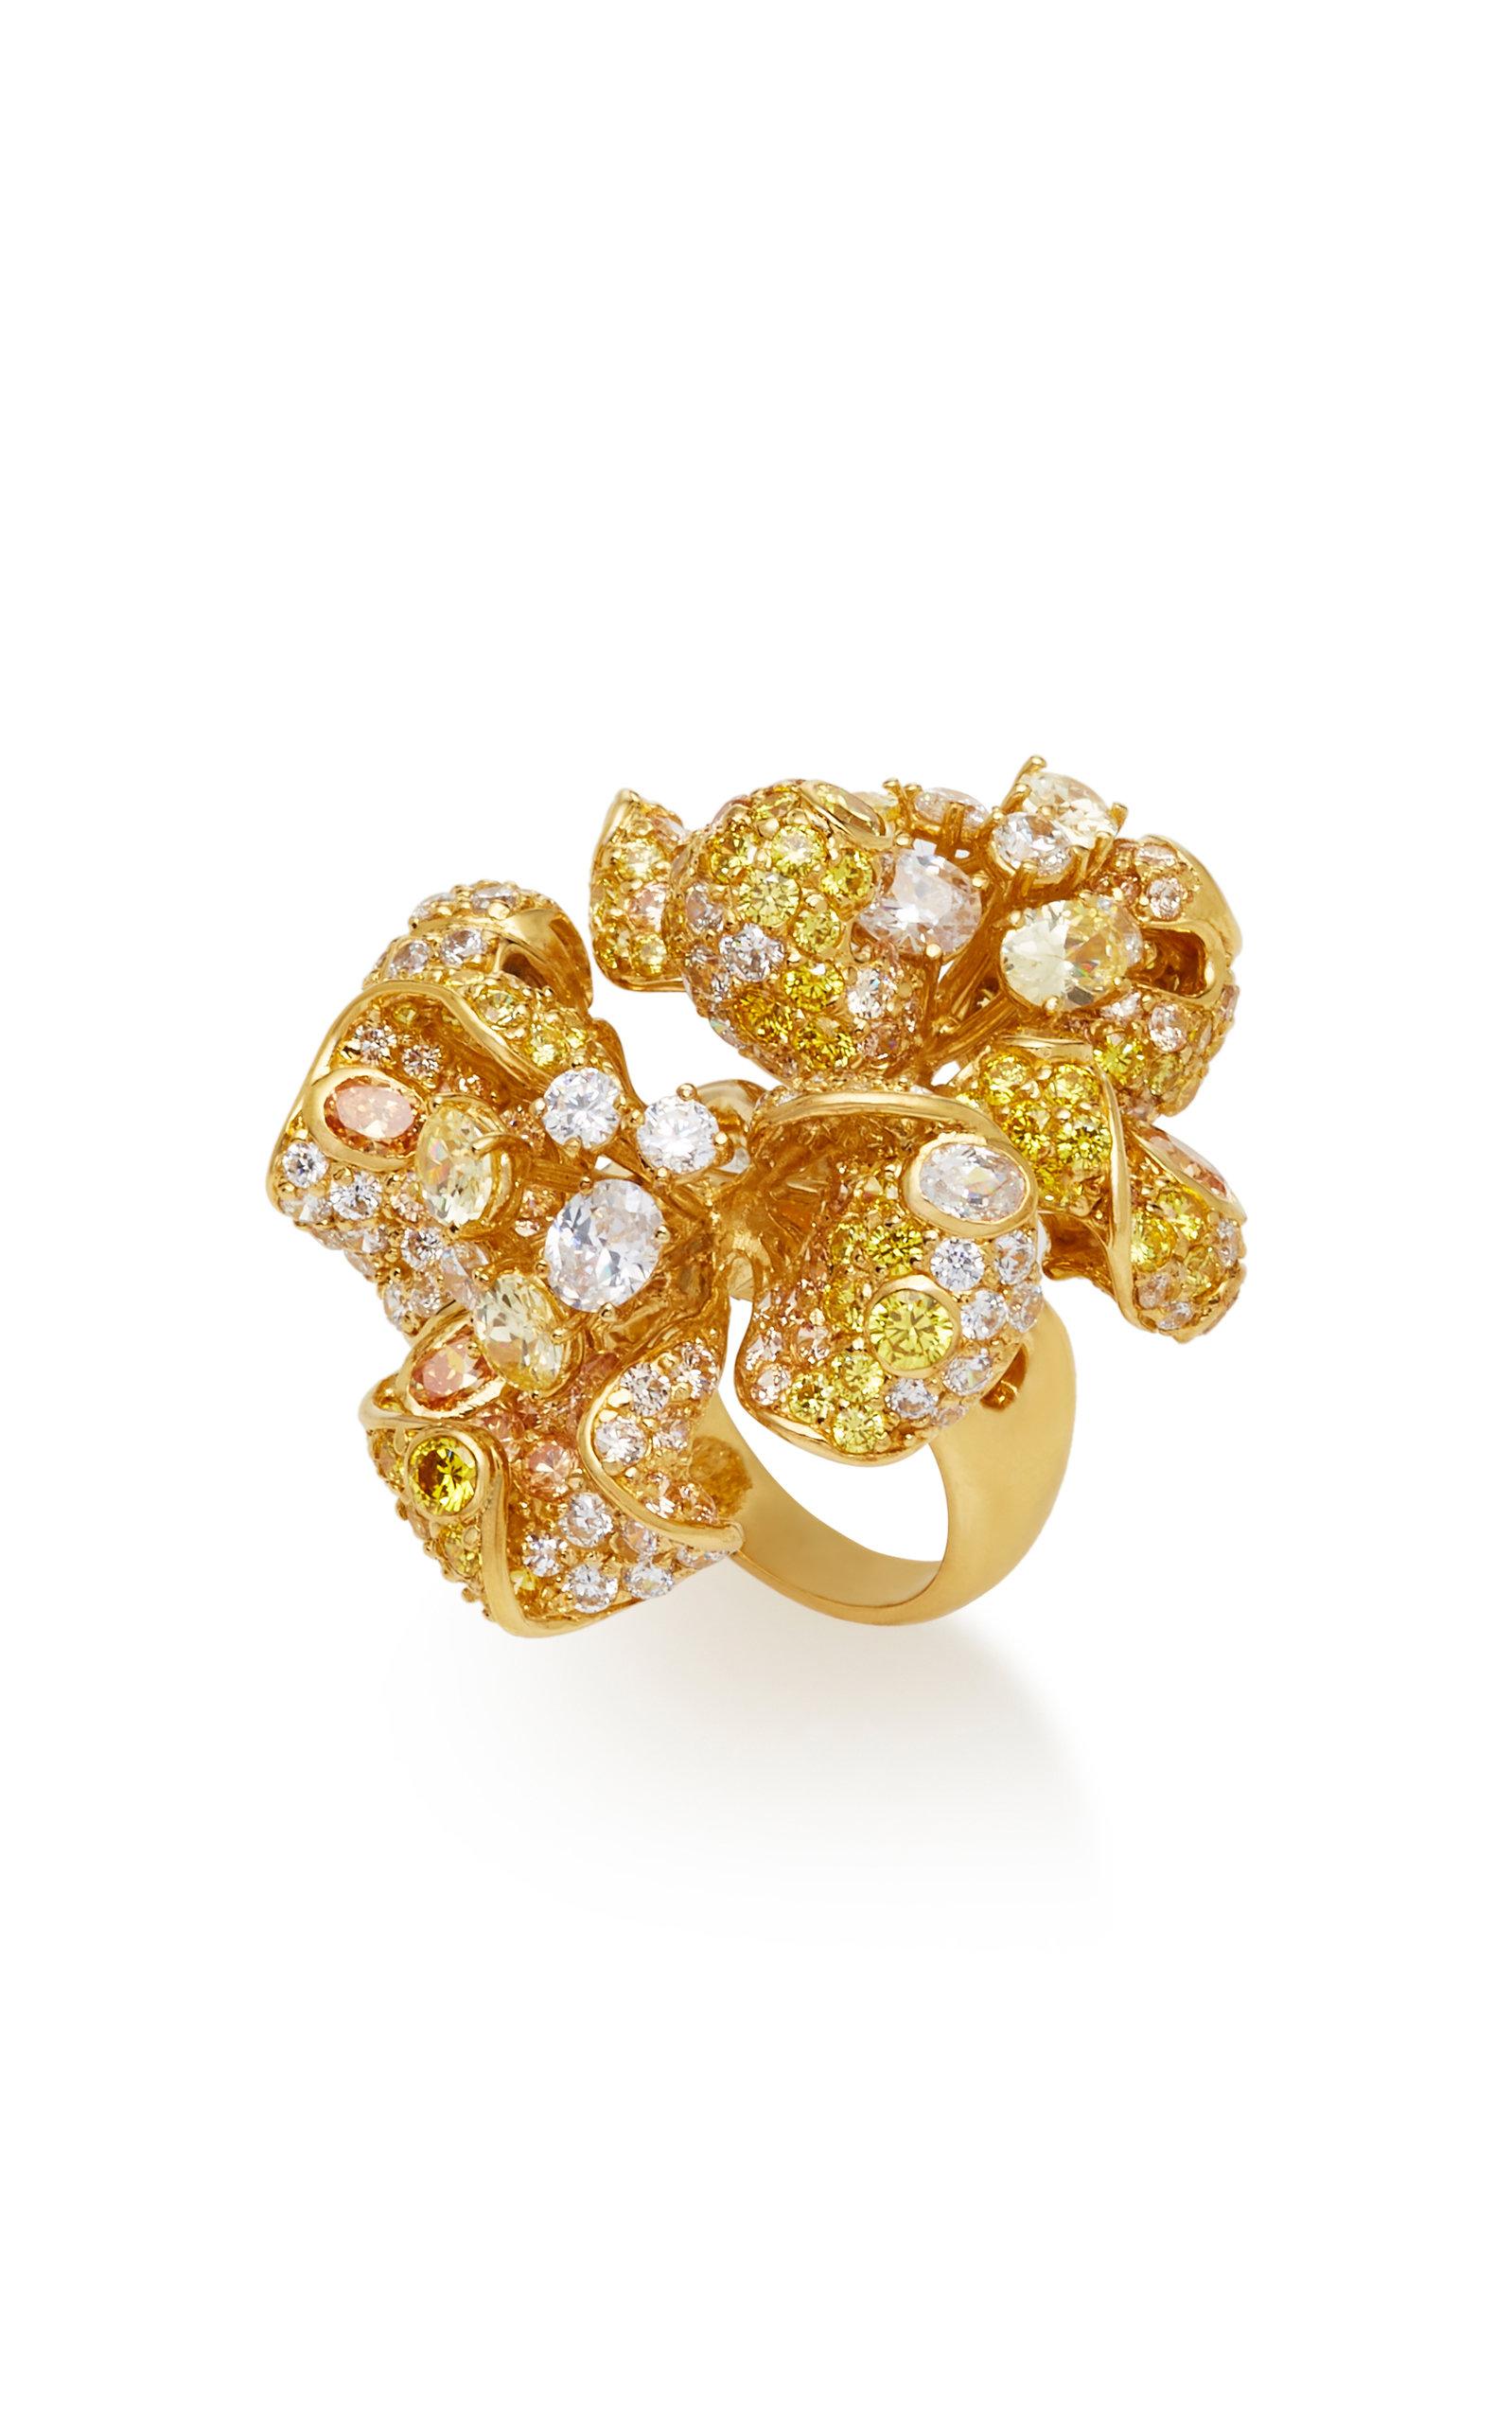 Bloomingdale 18K Gold Diamond Ring Anabela Chan mPkvcbI